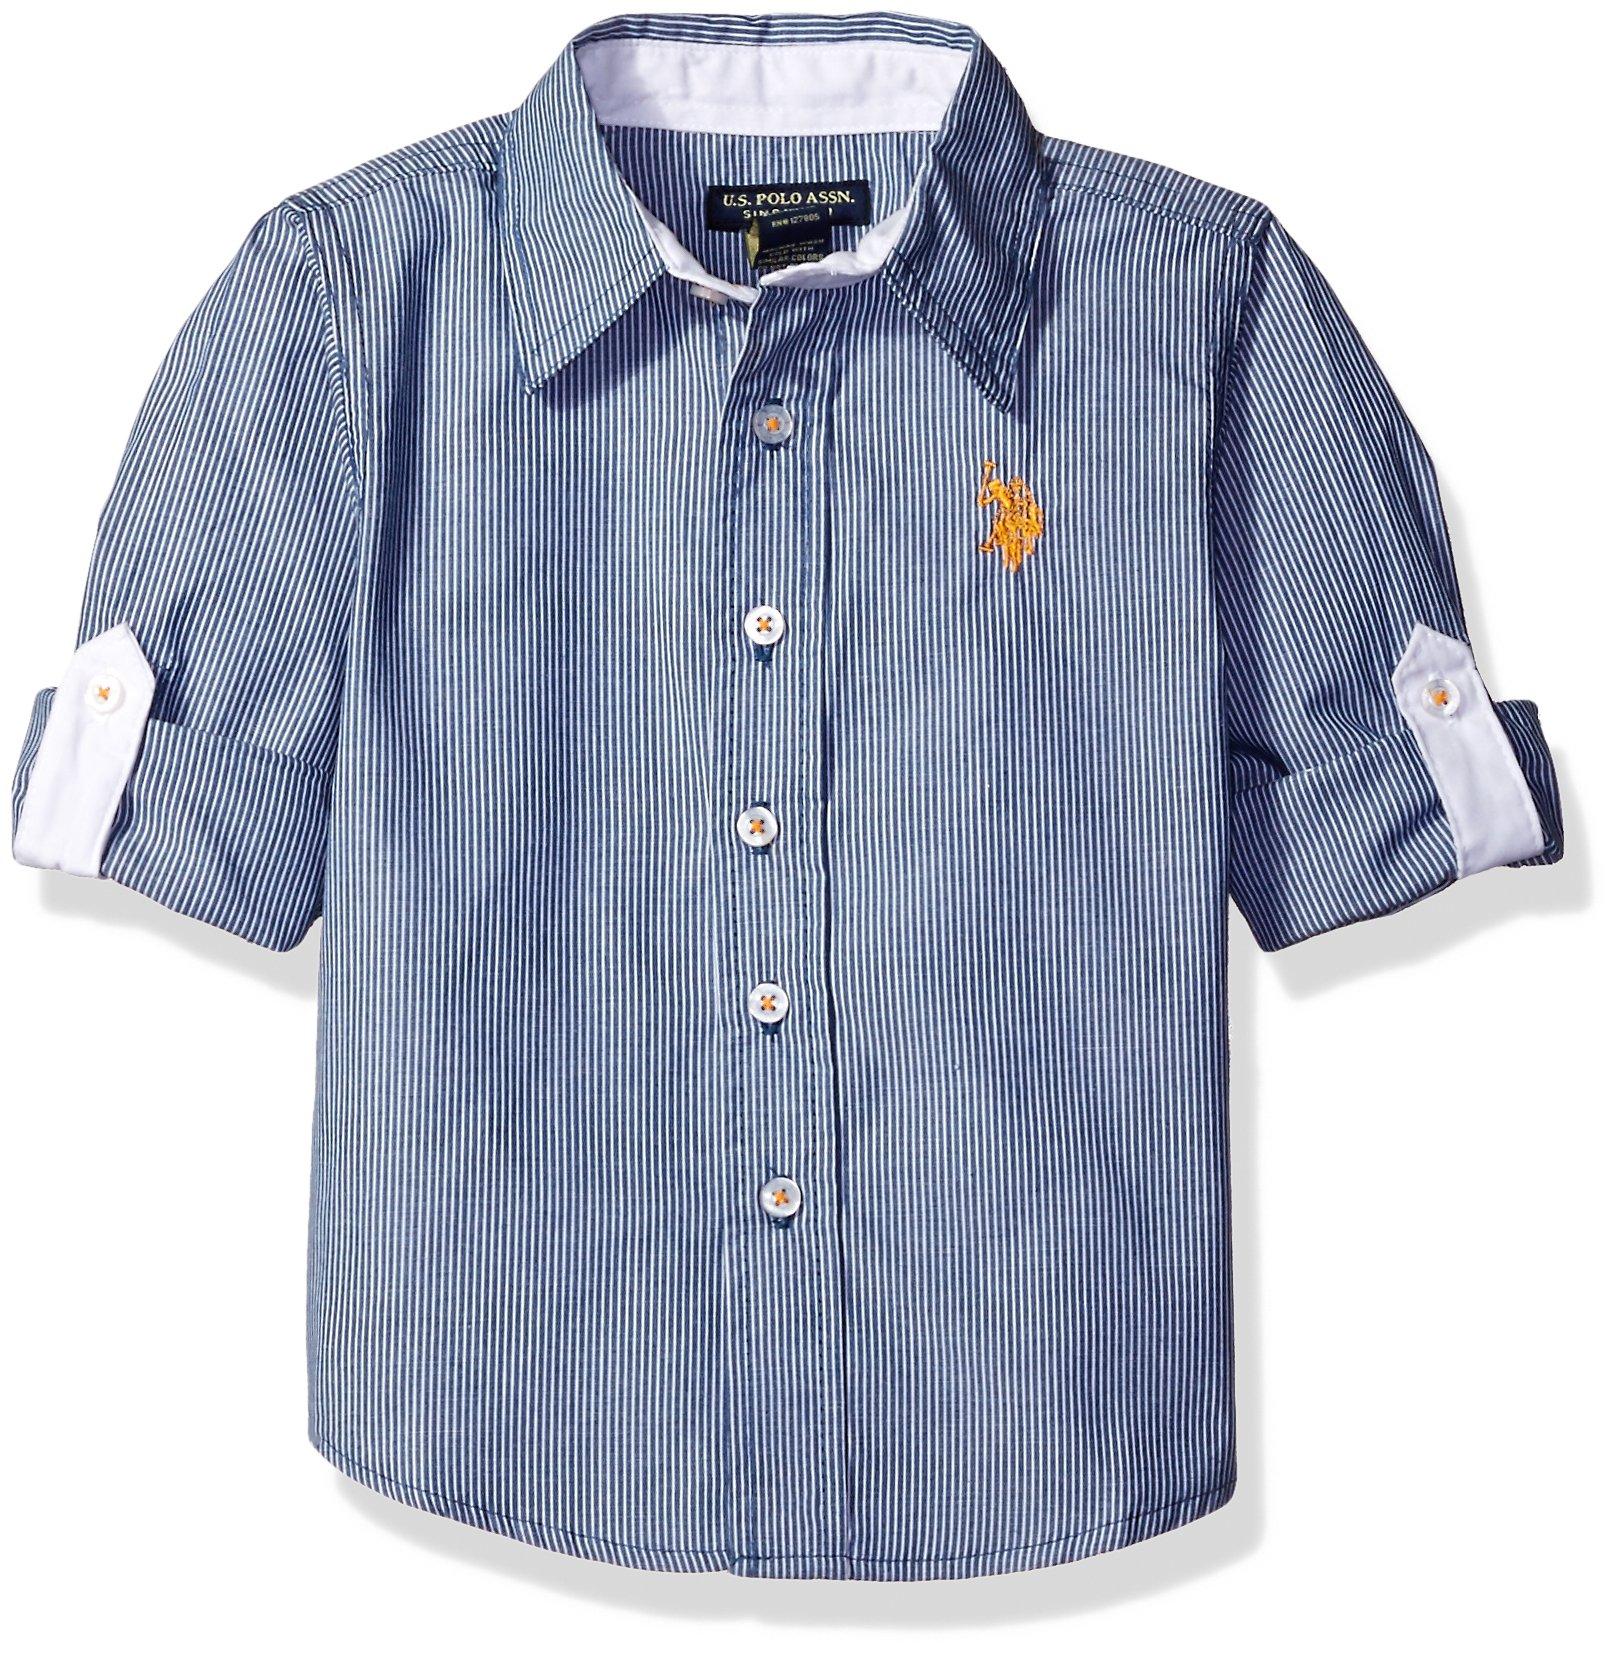 U.S. Polo Assn. Little Boys' All Cotton Clean Front Point Collar Long Sleeve Woven Shirt, Blue, 2T